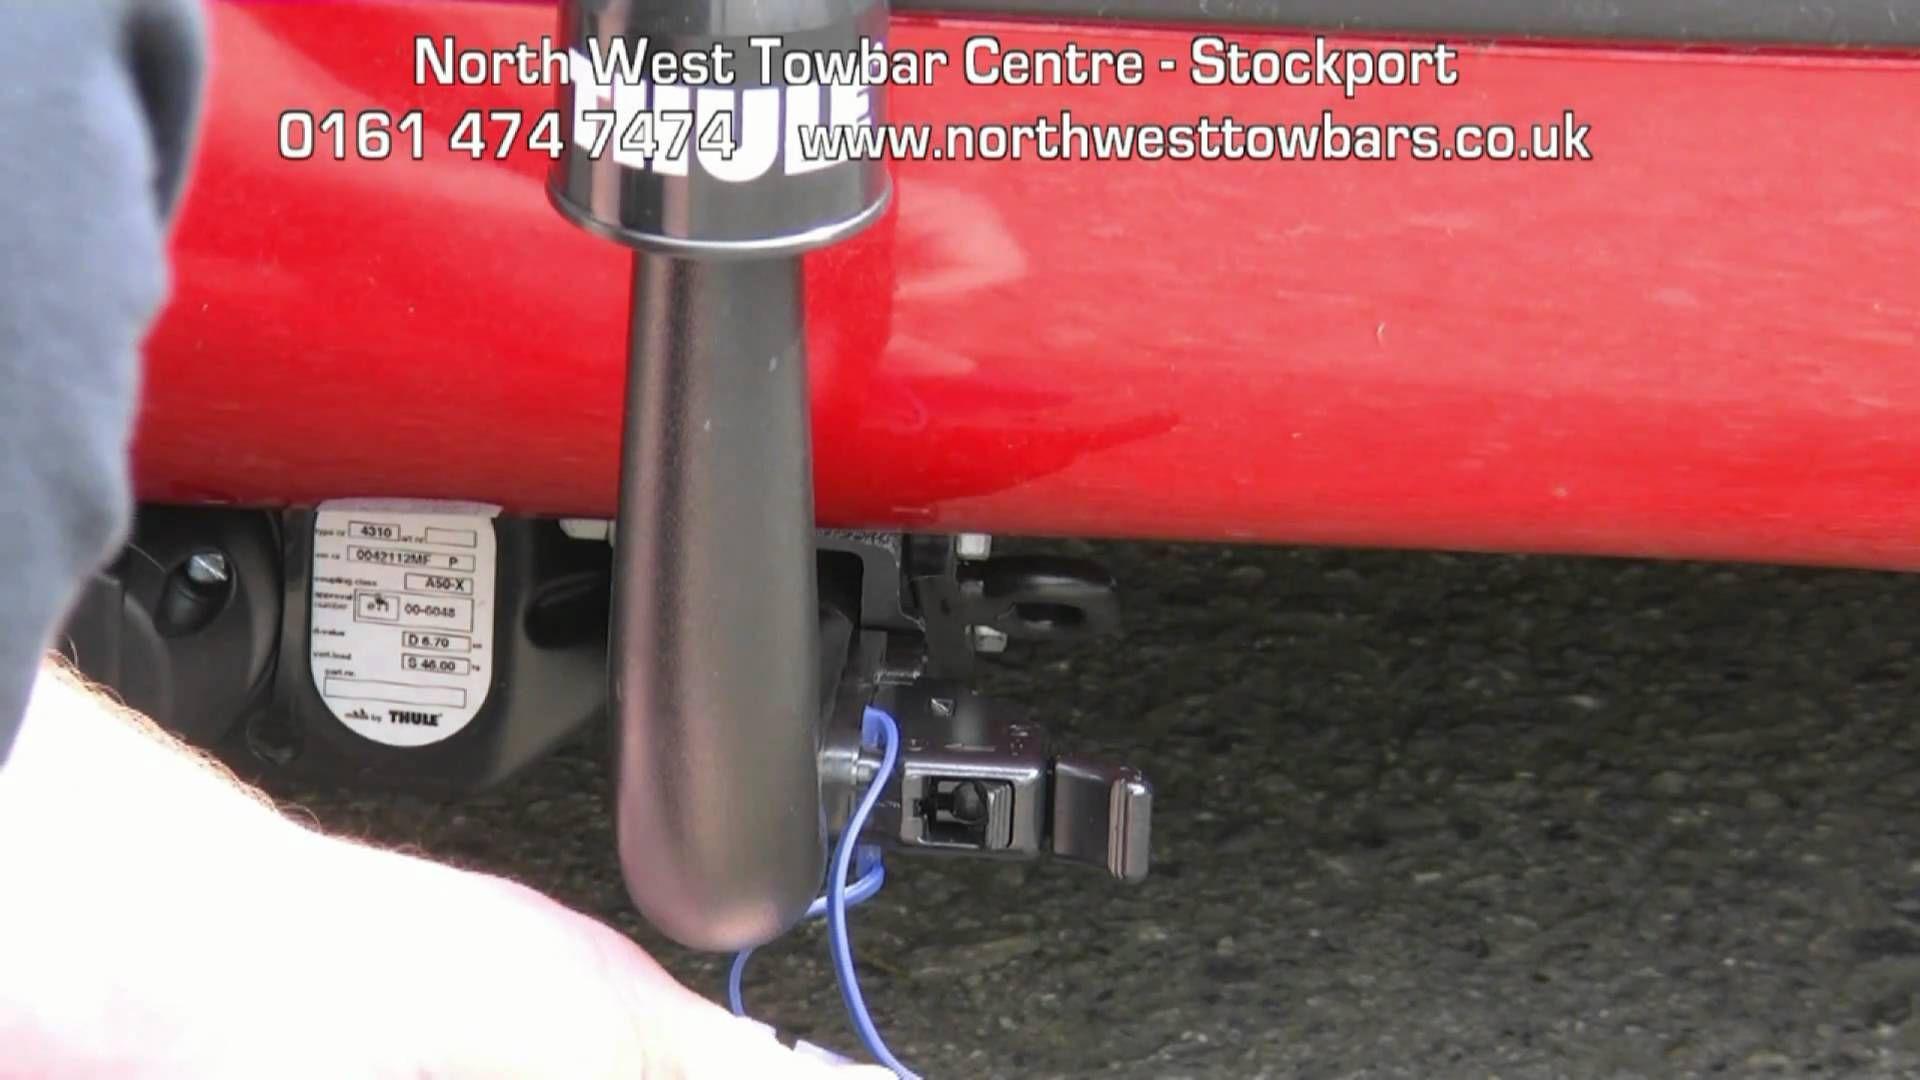 wrg 1887] peugeot 308 towbar wiring diagram Trailer Dolly Peugeot 308 Towbar Wiring Diagram #17